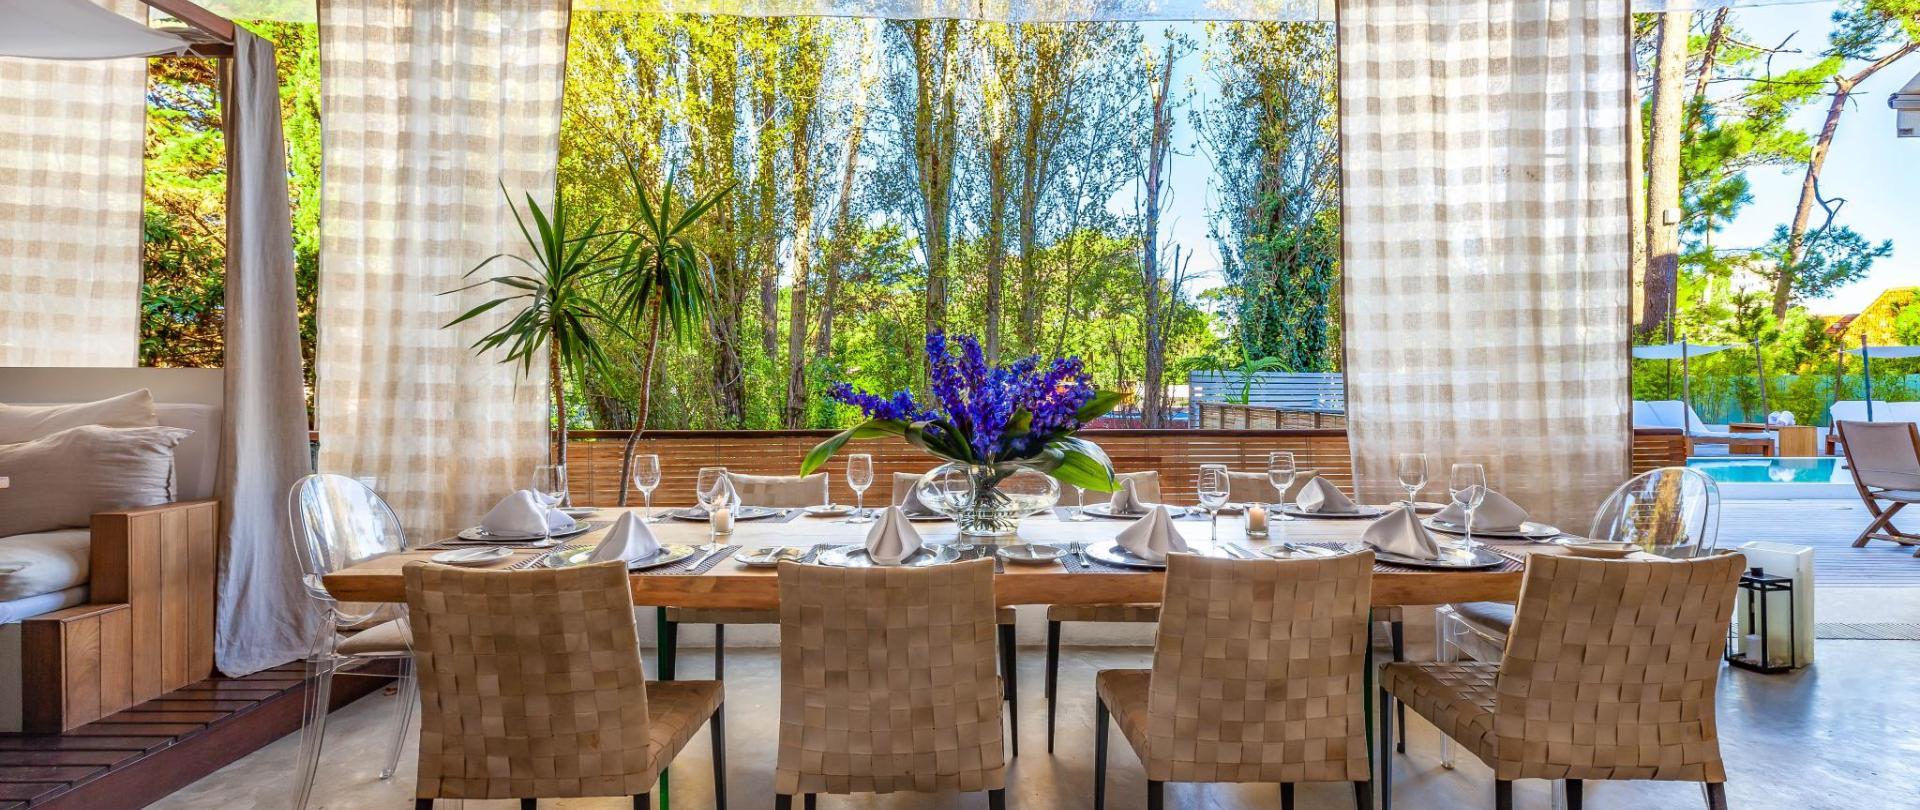 009_Dining_Table.jpg